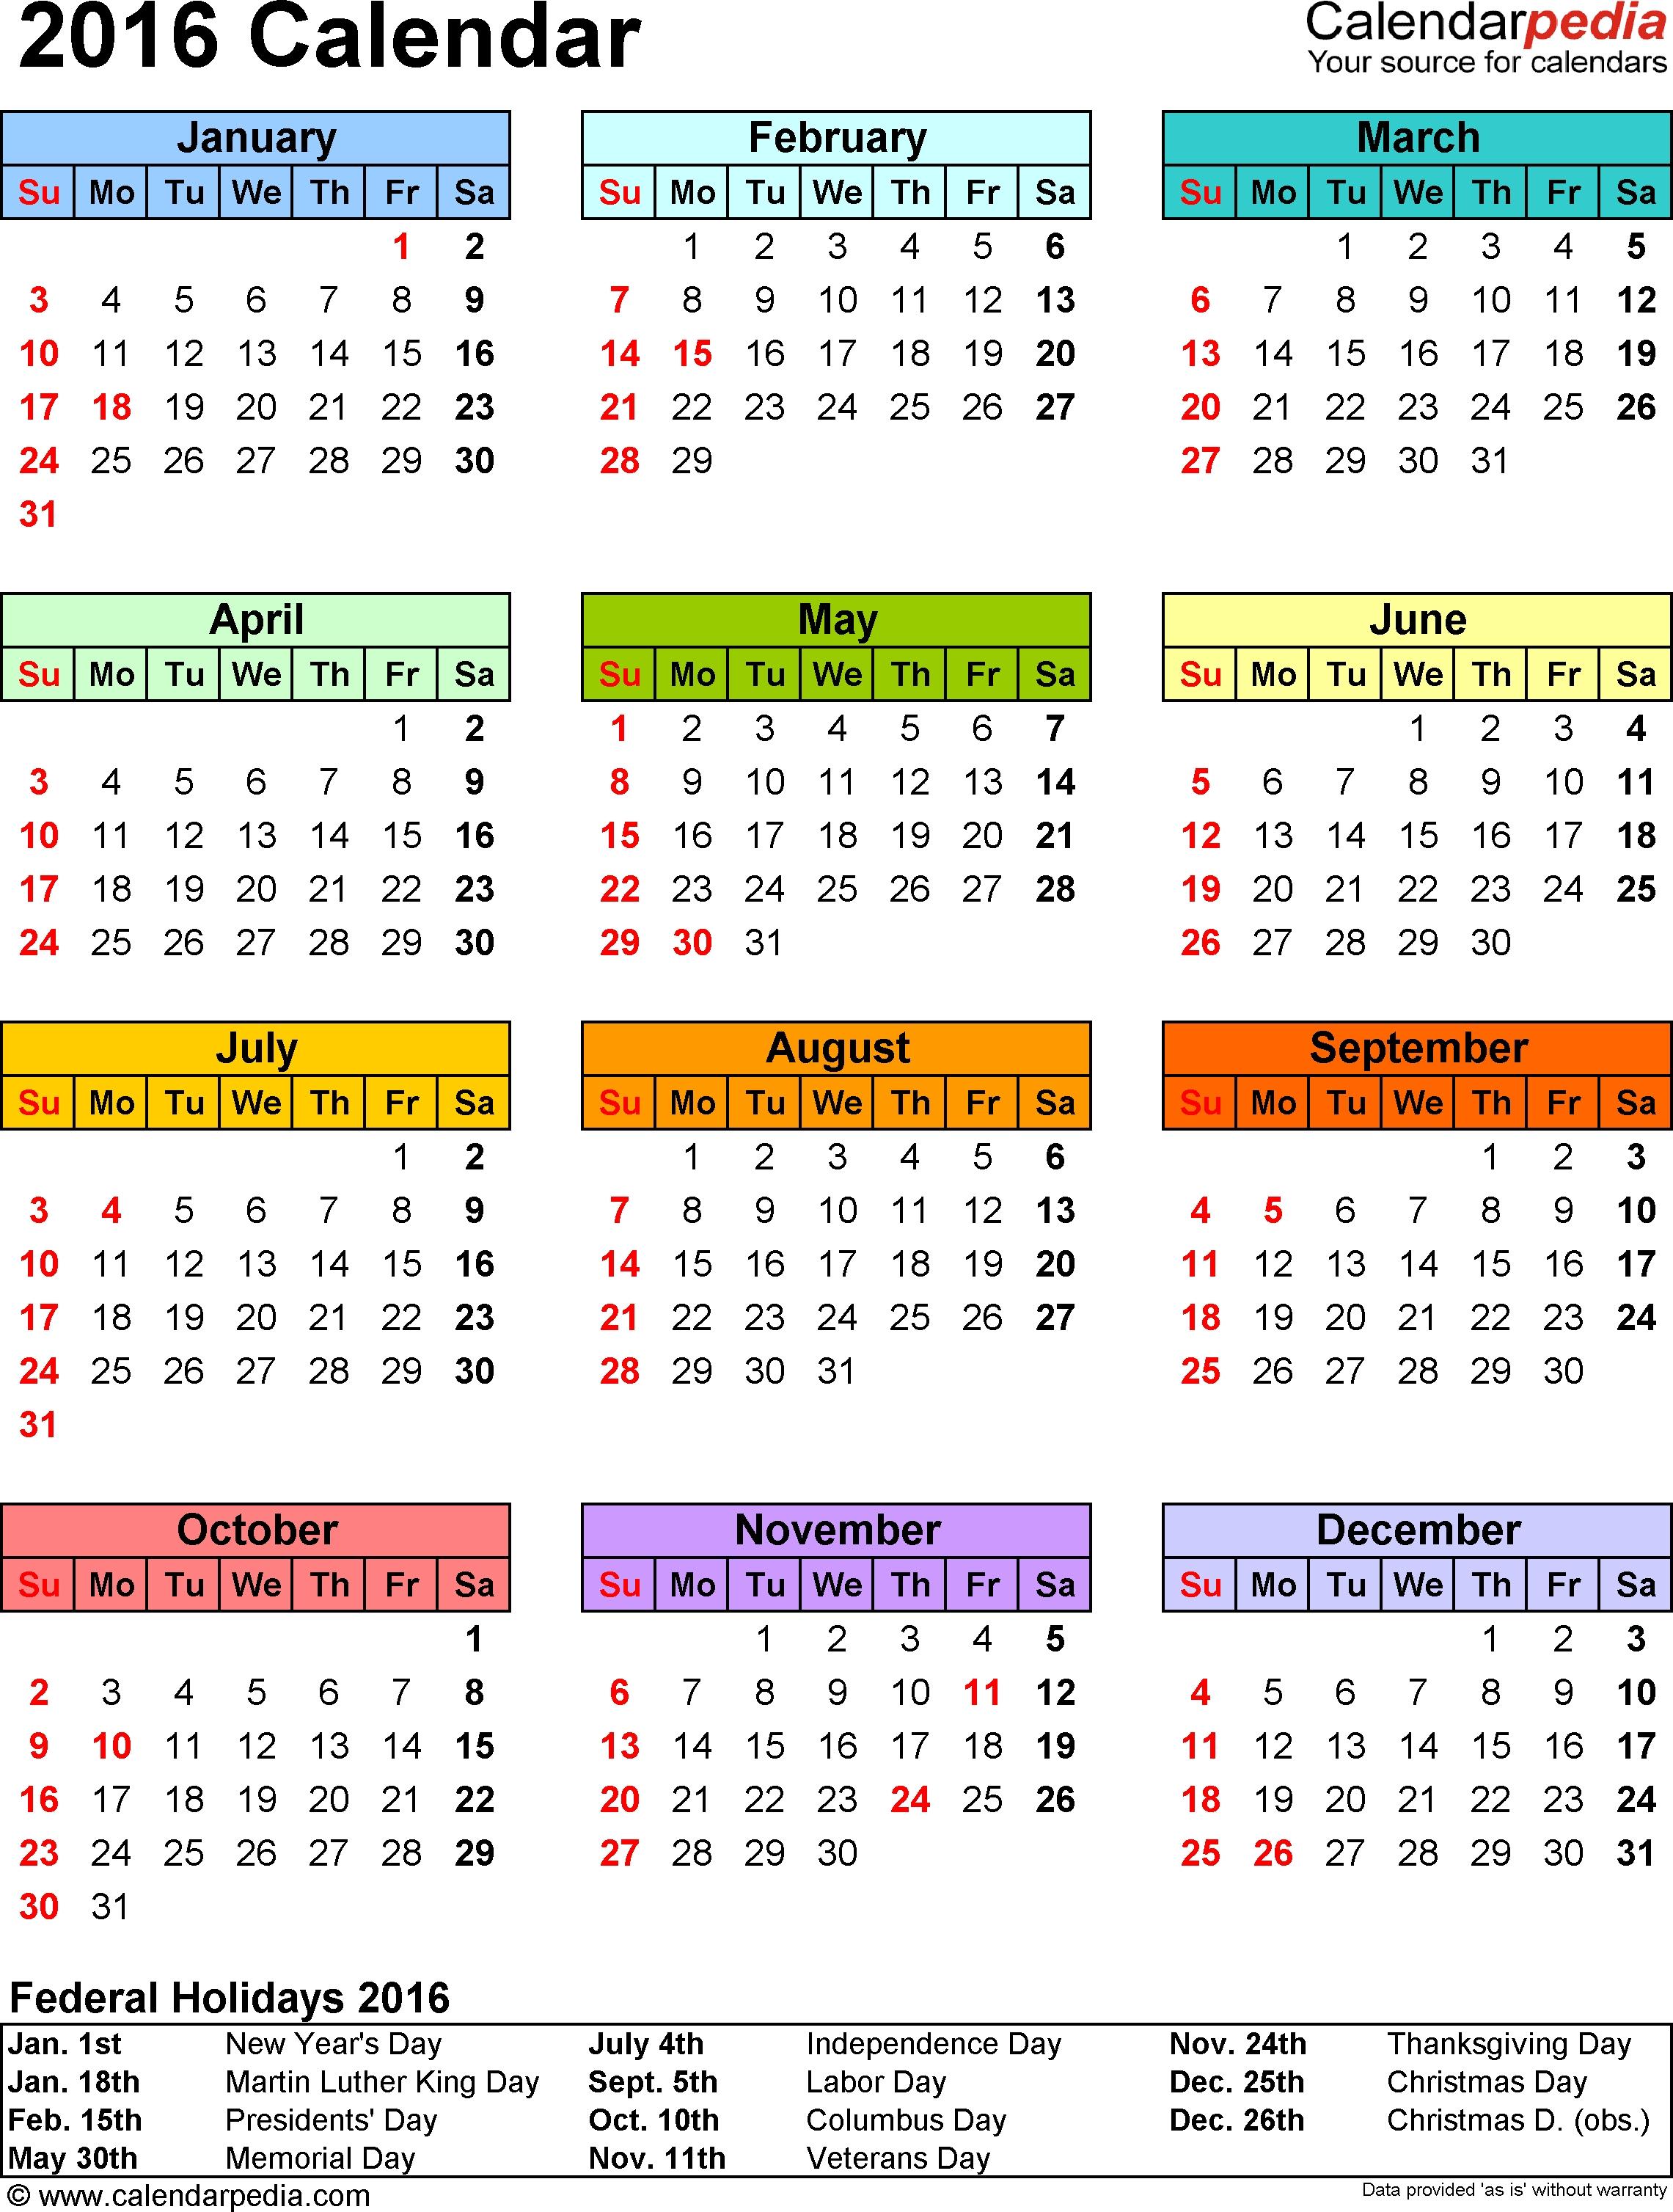 2016 Calendar - Download 16 Free Printable Excel Templates (.xlsx)